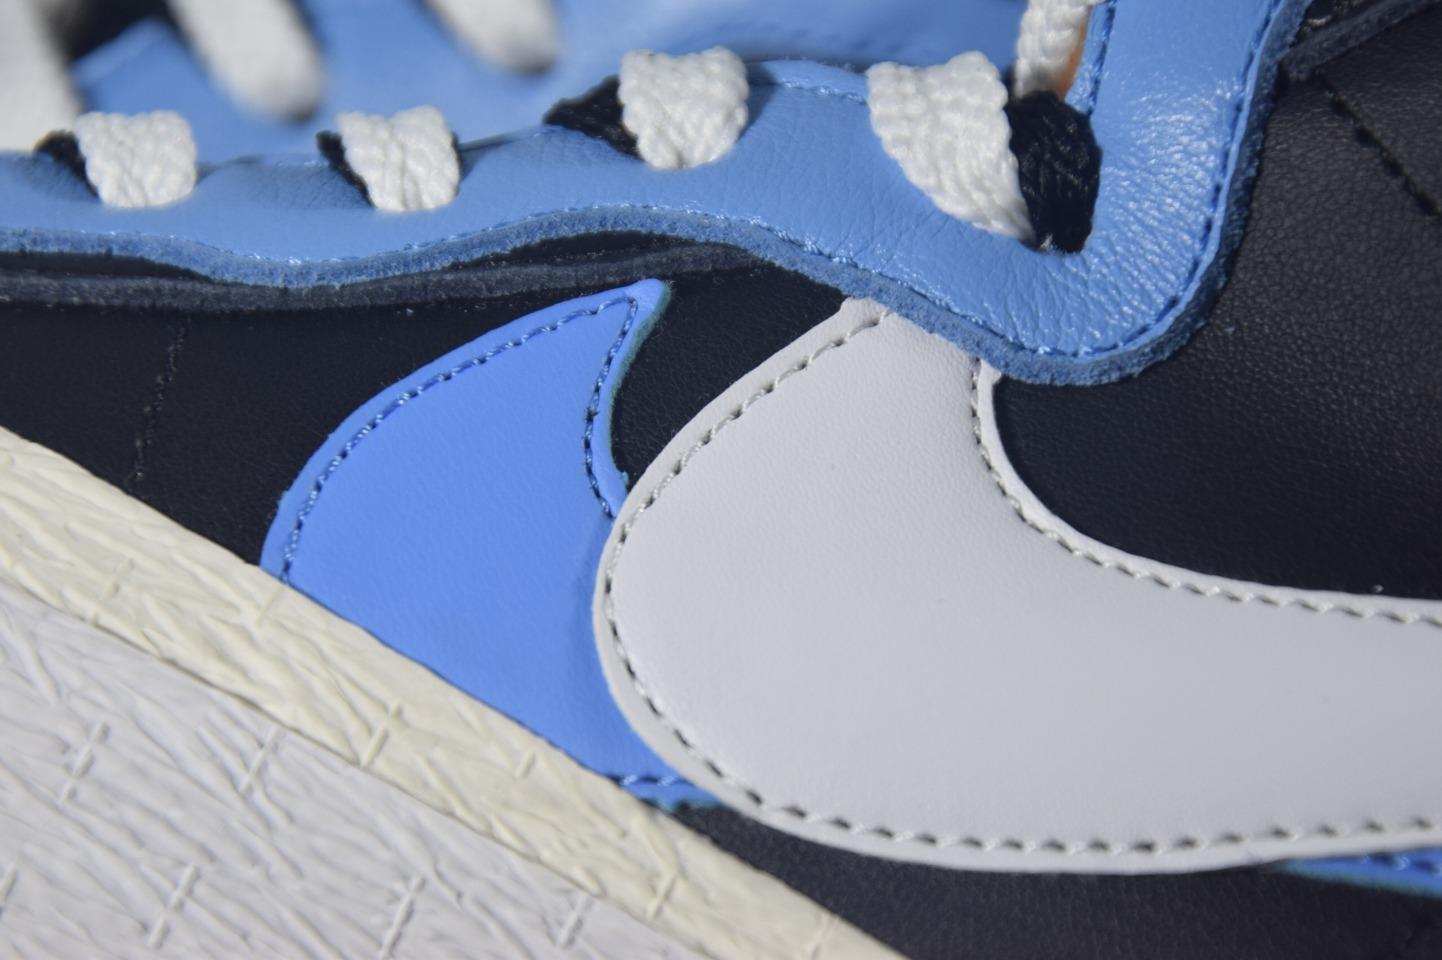 Top版本Sacai X Blazer Mid Black Blue 黑蓝 BV0072-001_椰子g5版本是什么意思